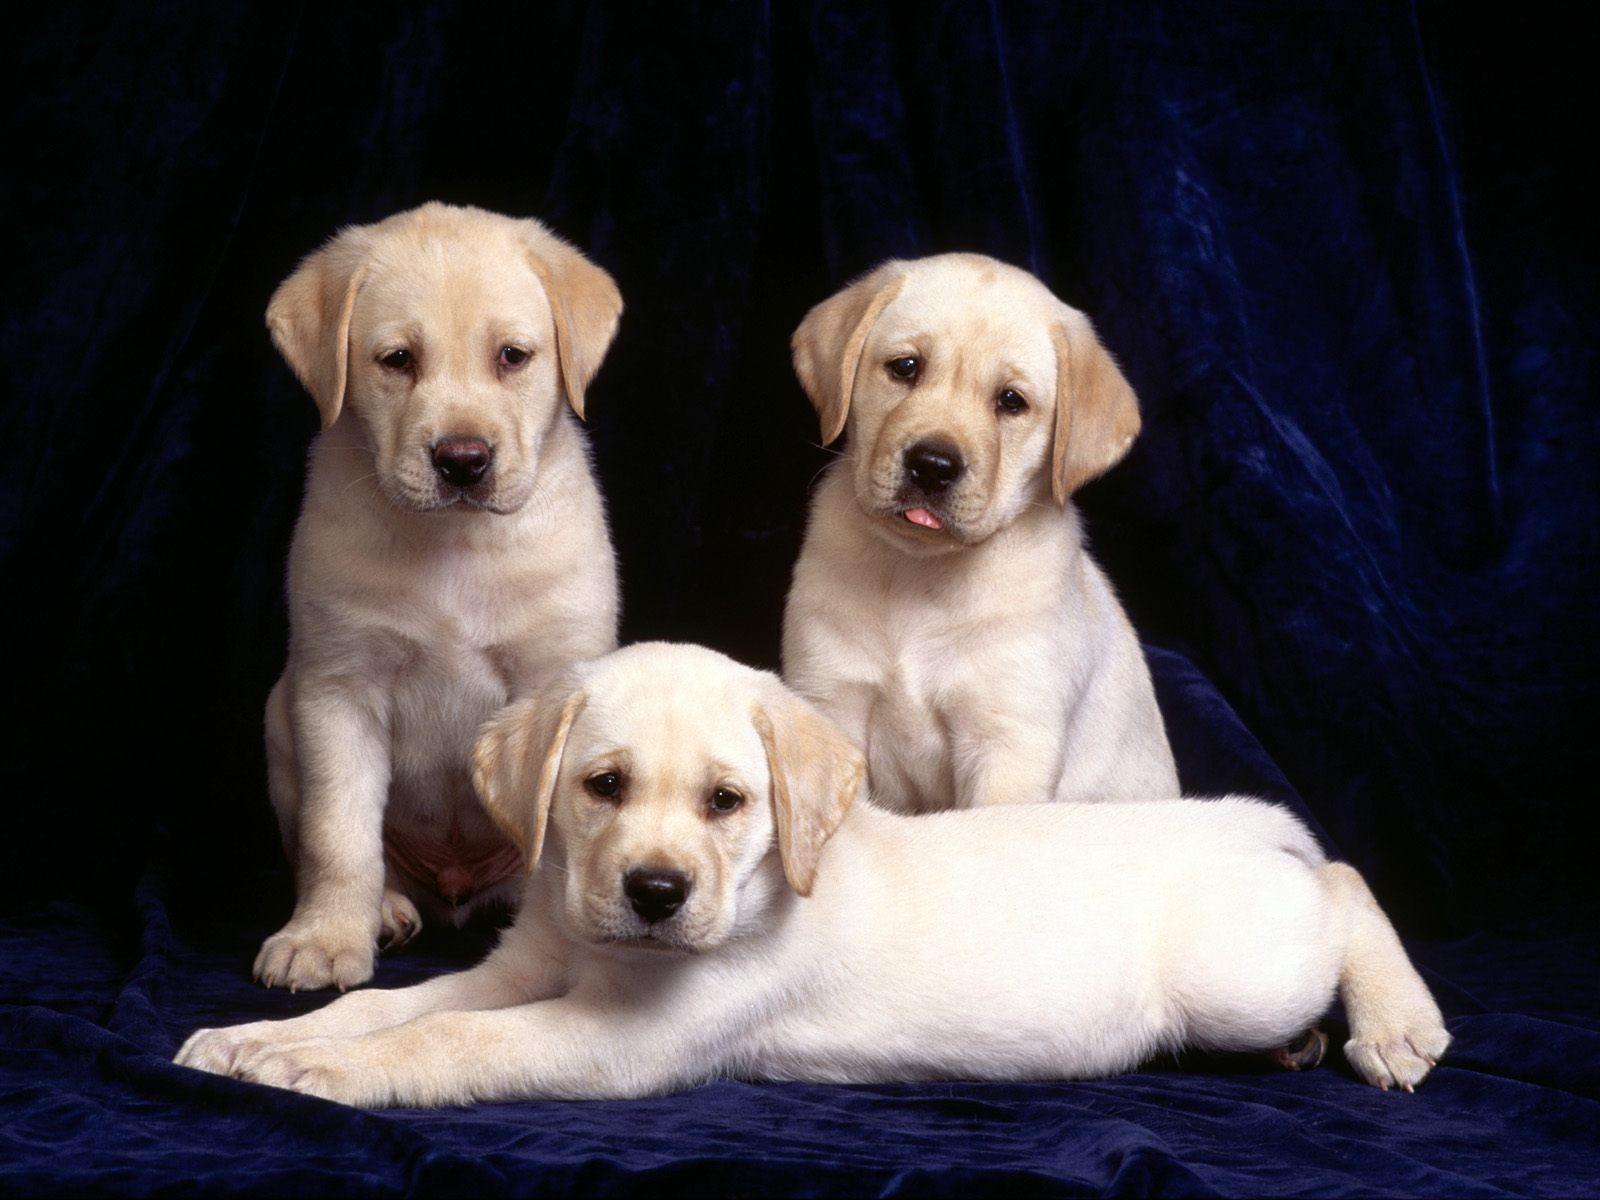 Puppy Wallpaper For Bedroom Dog Wallpaper For Home Wallpapersafari